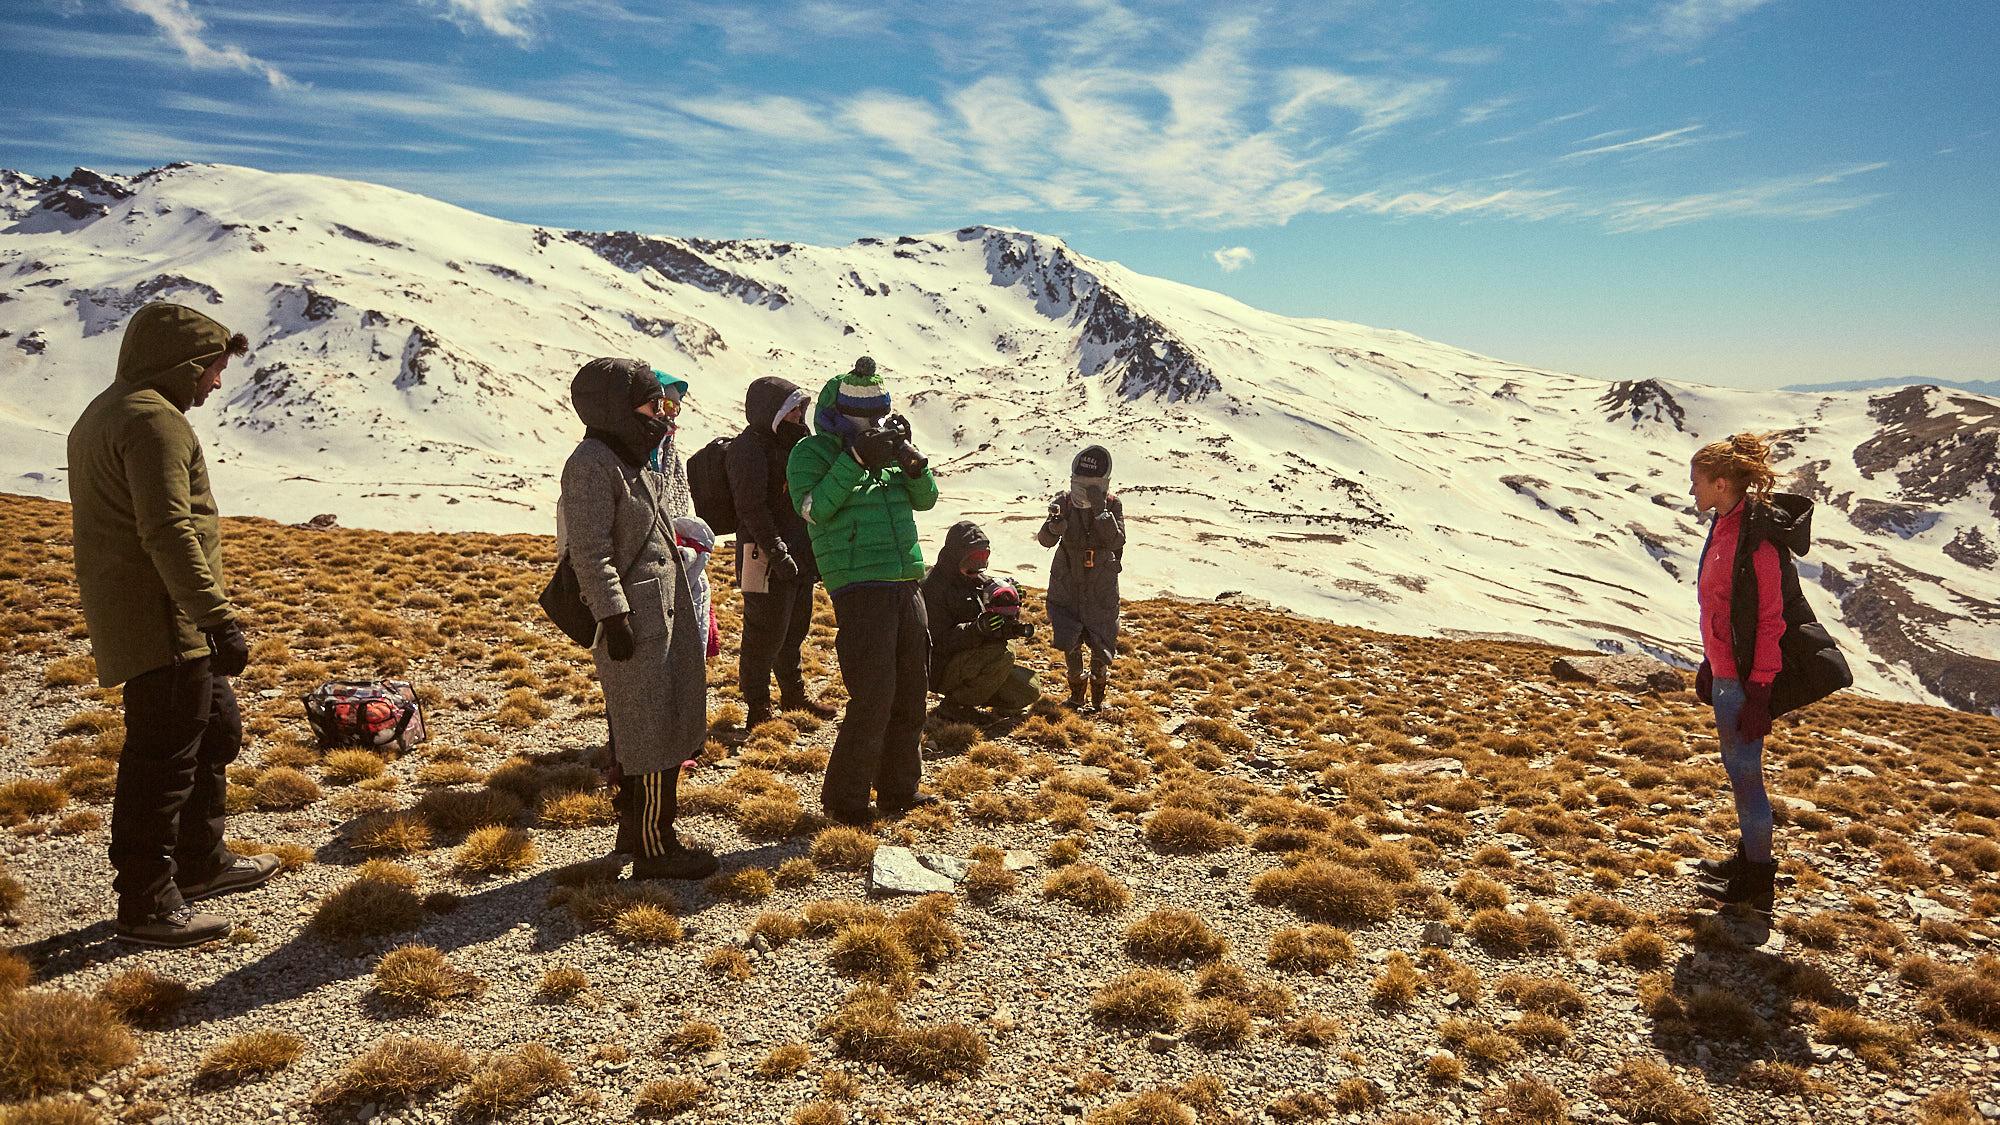 Sierra Nevada Outhorn Gardias Marcin Biedroń